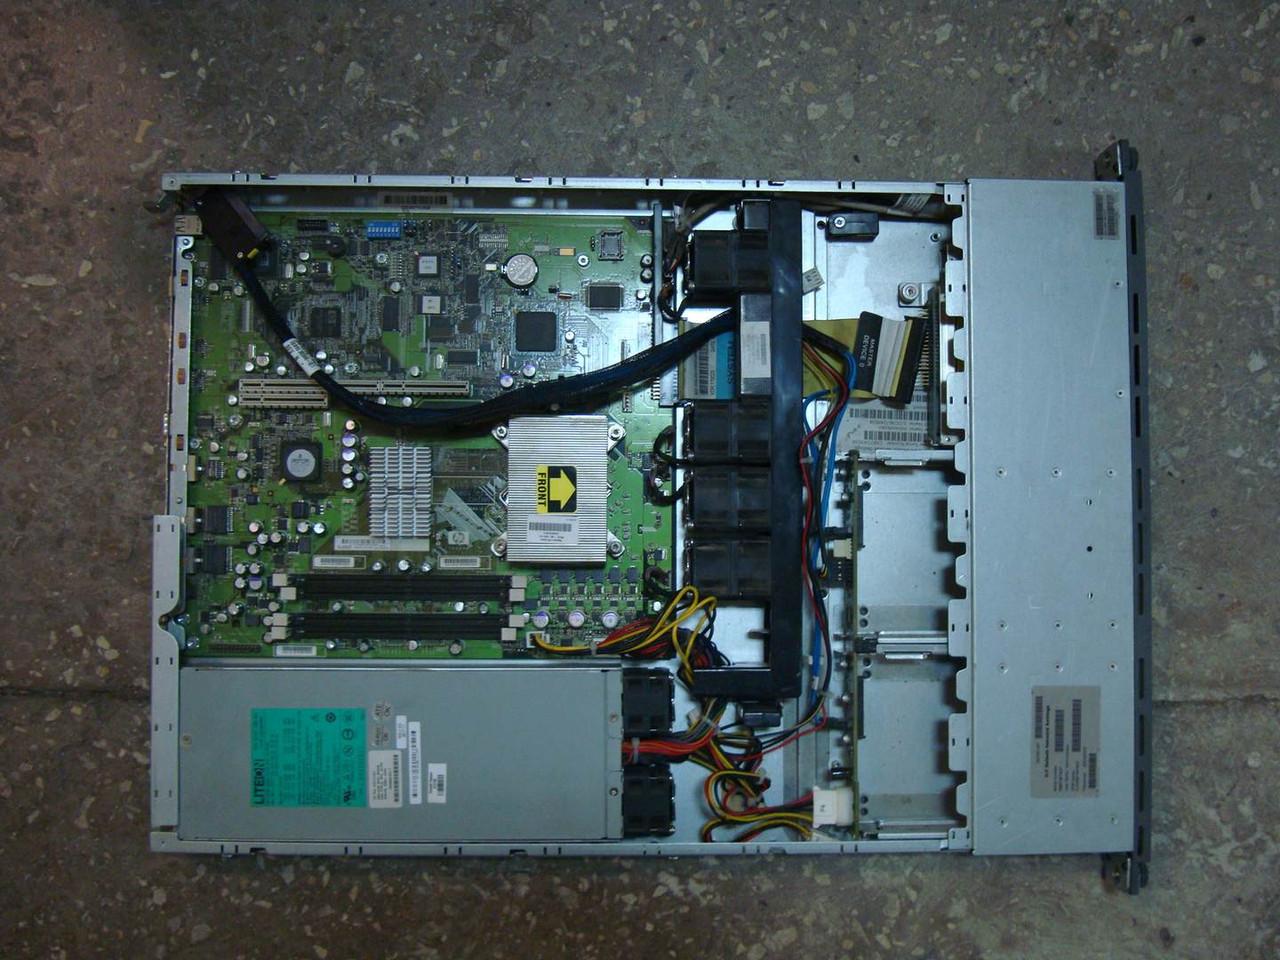 Cервер HP ProLiant DL320 G5 на запчасти без корпуса